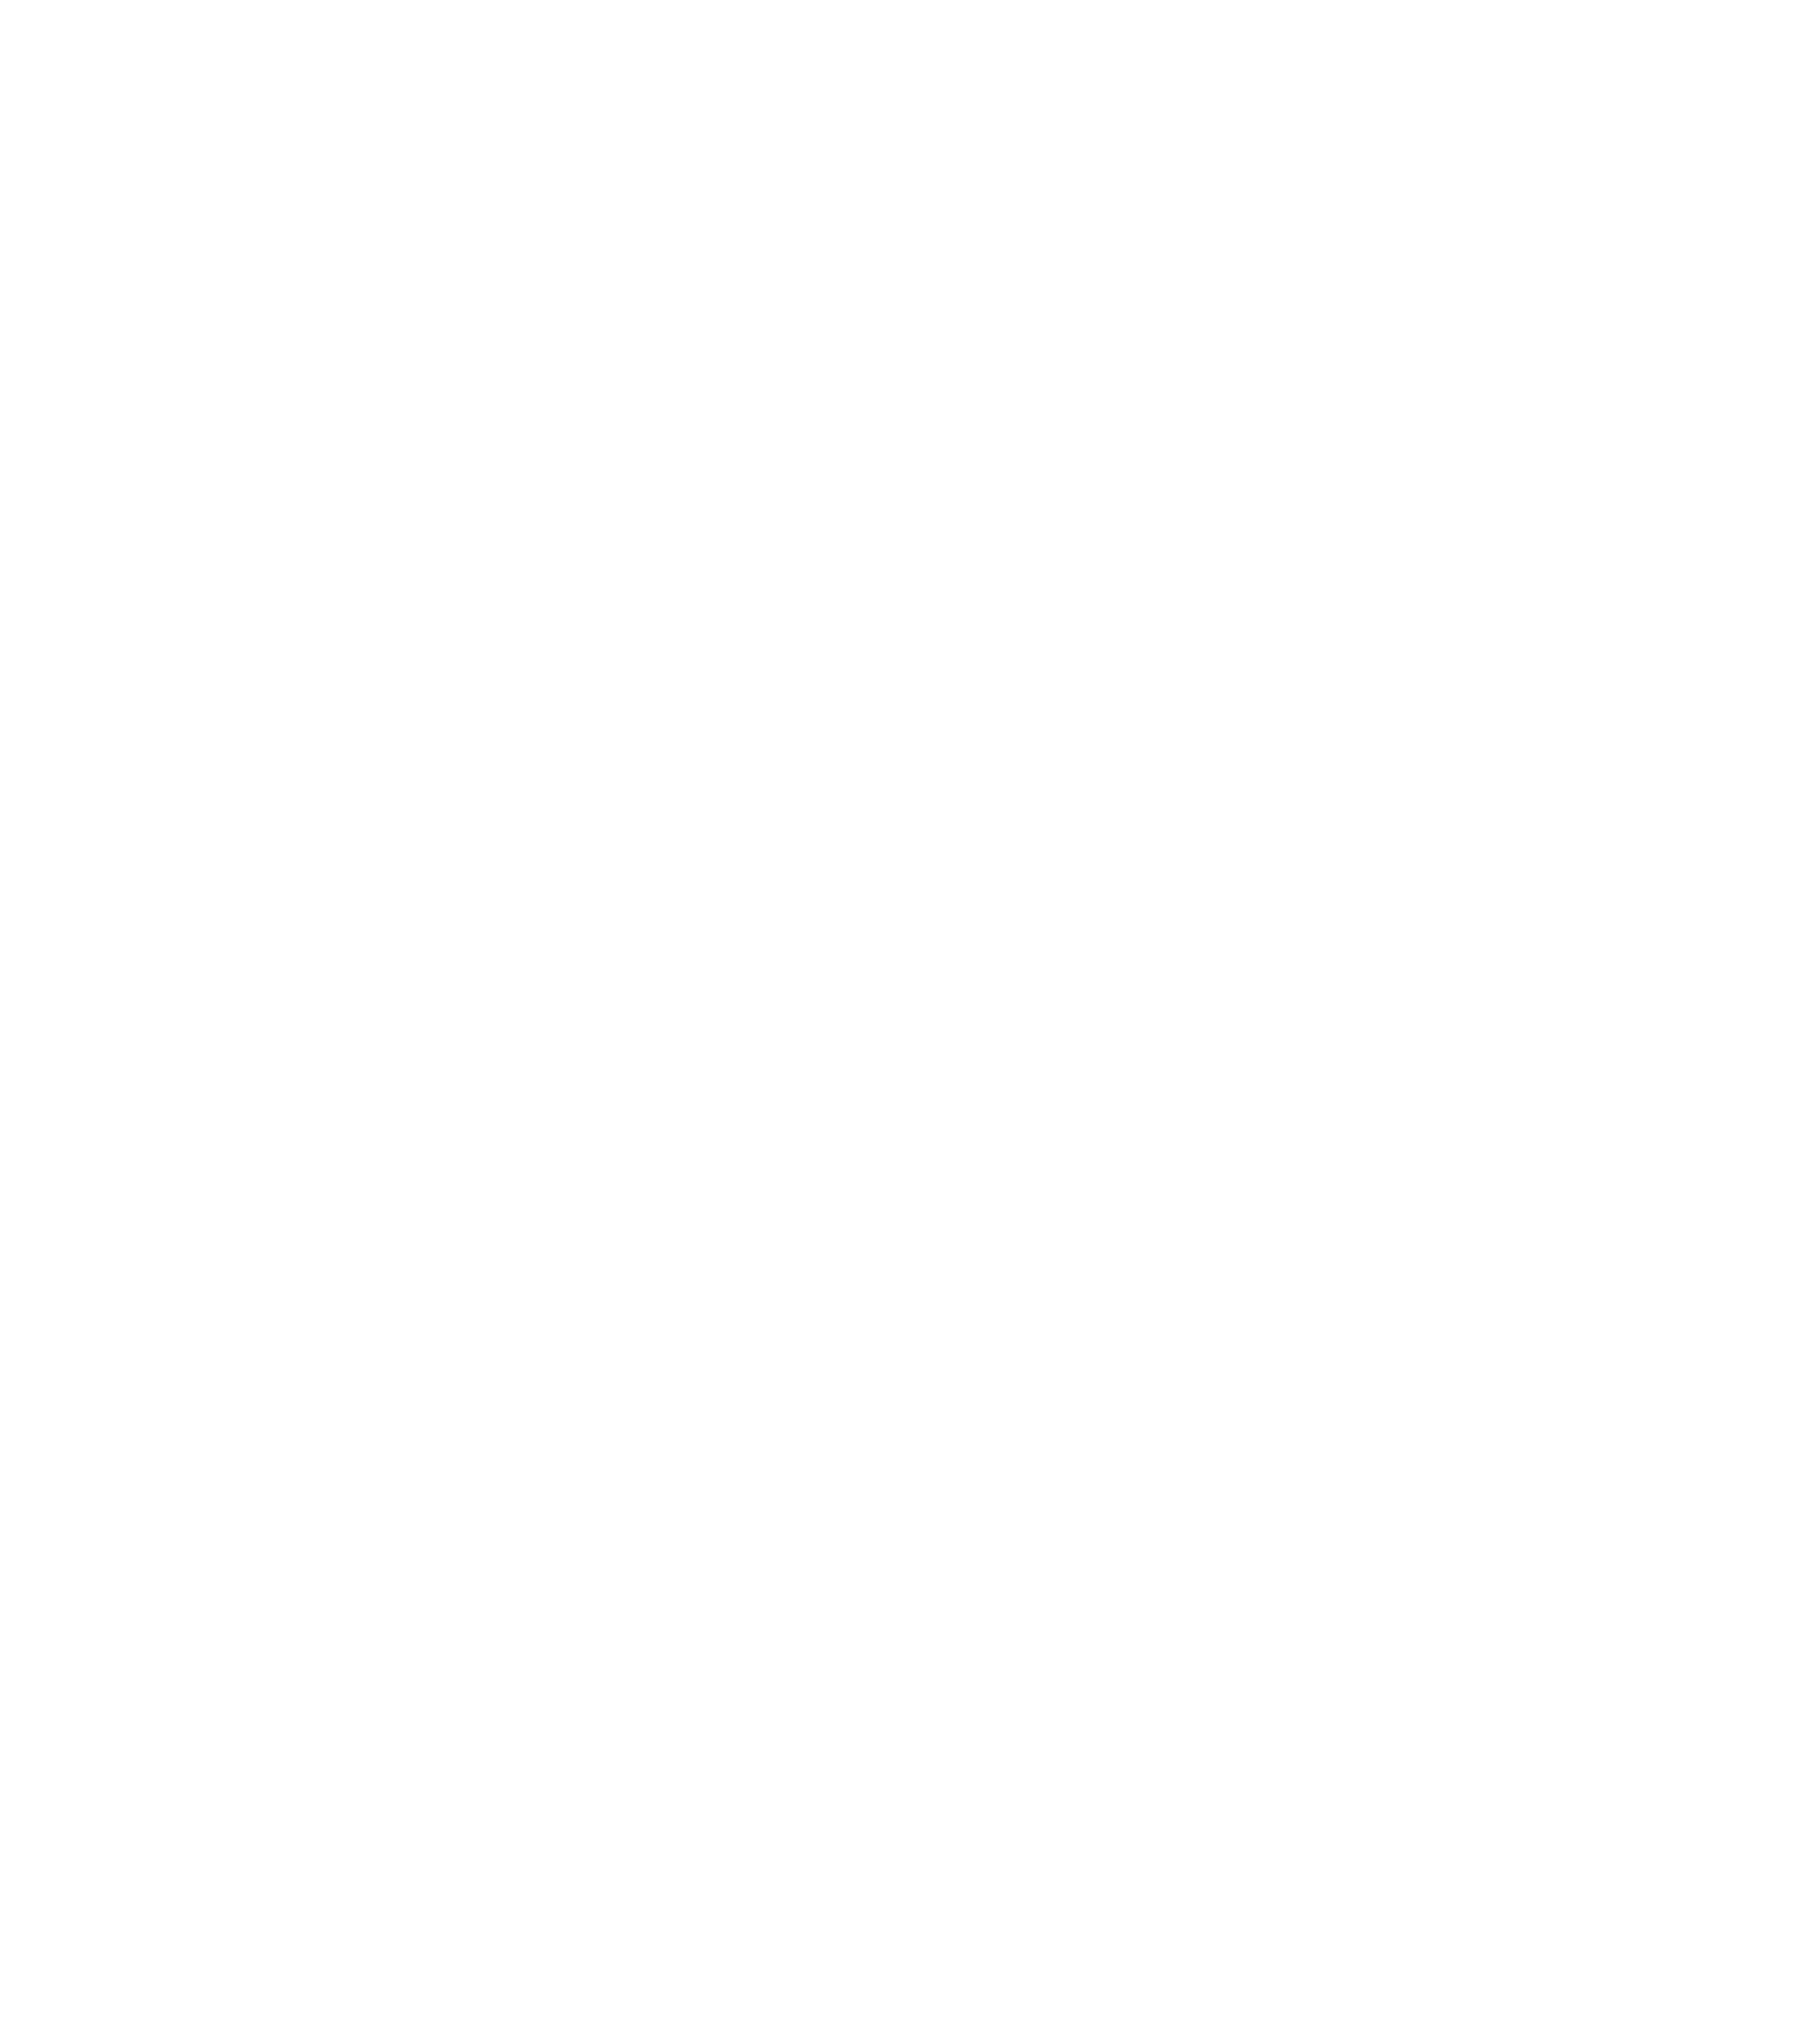 Sunday Night Standings